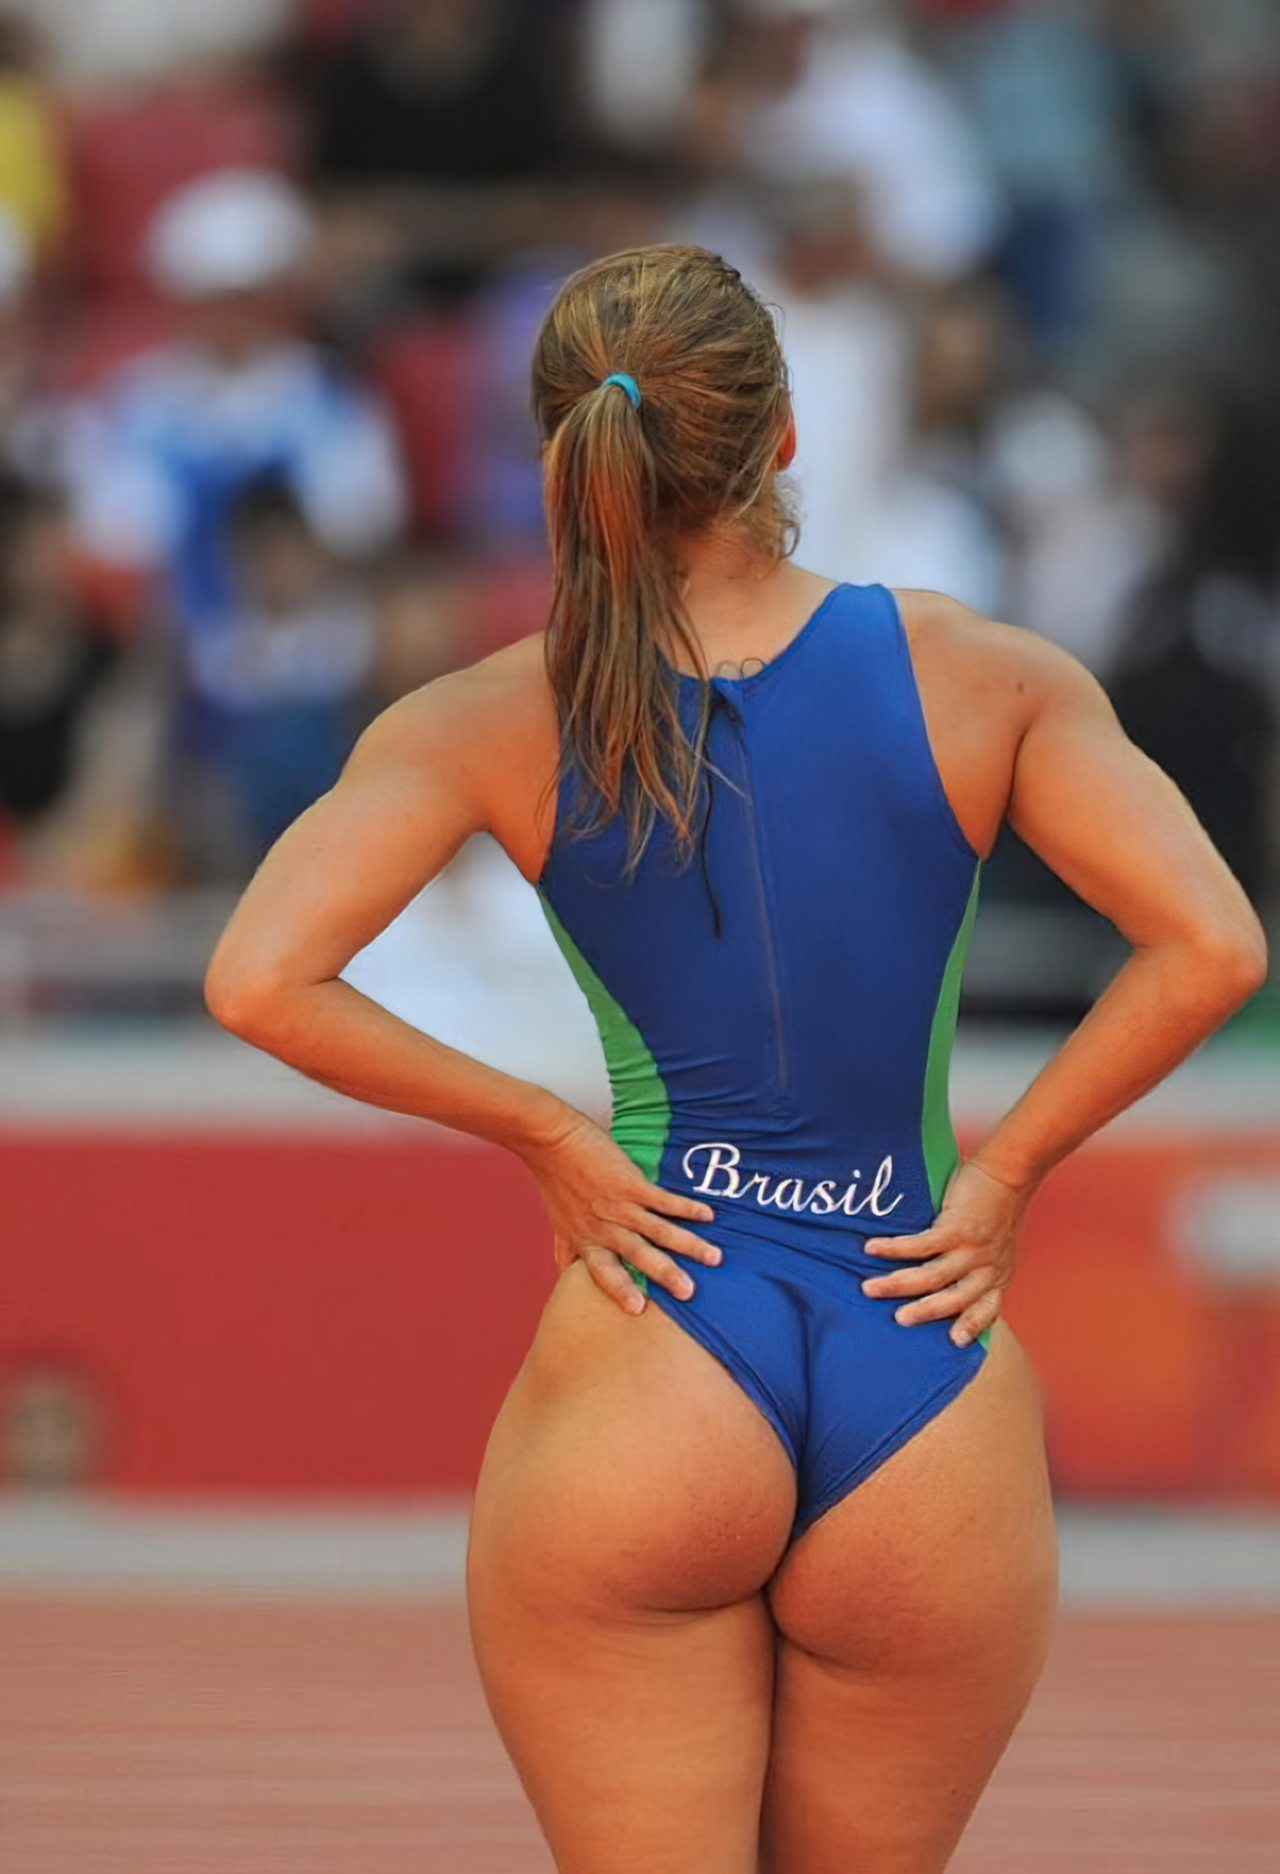 Cu Brasileiro